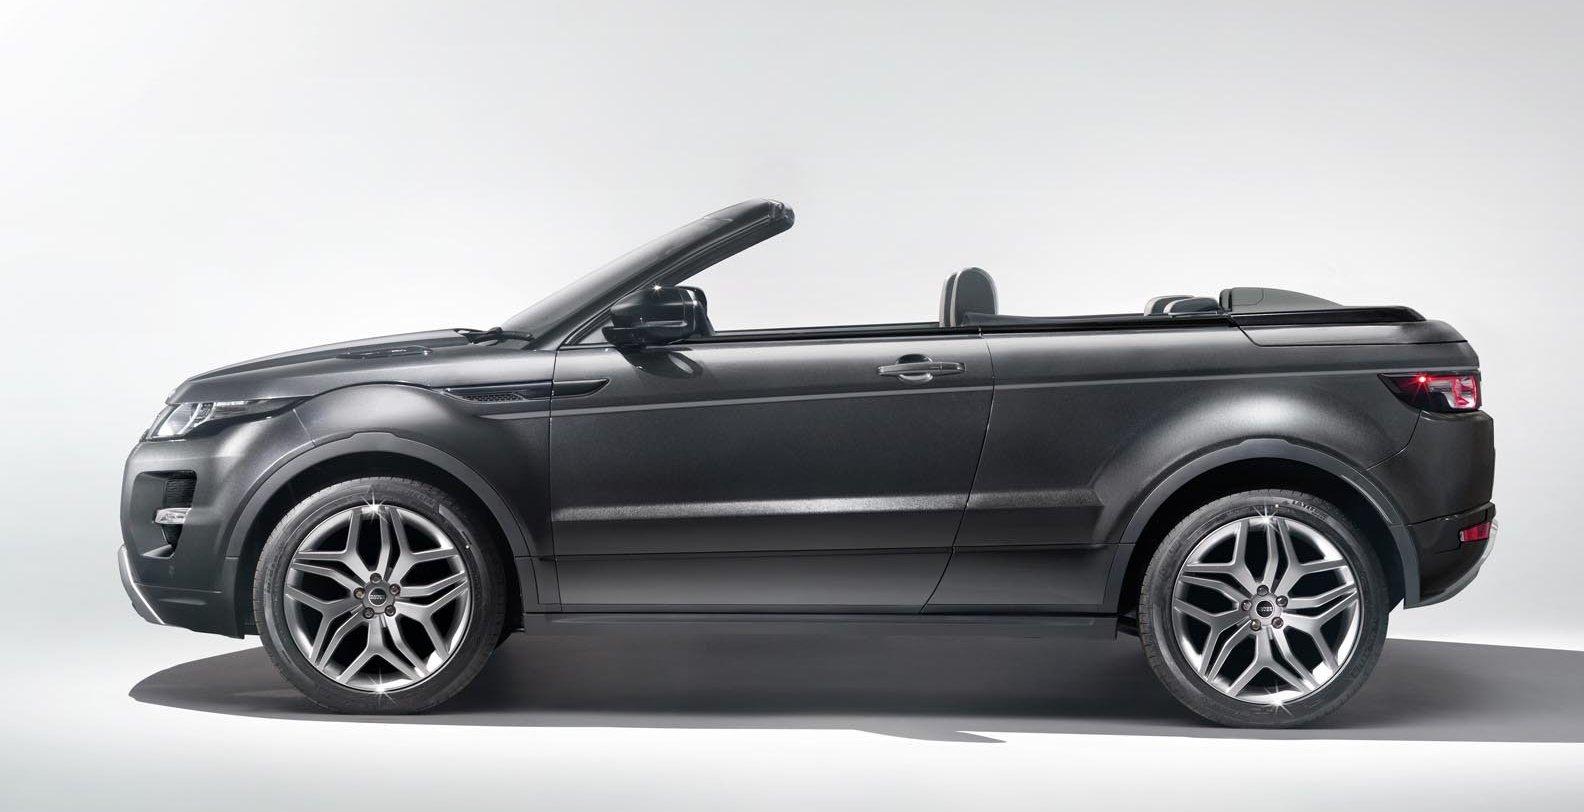 range rover evoque convertible concept 2012 geneva motor show garage car. Black Bedroom Furniture Sets. Home Design Ideas